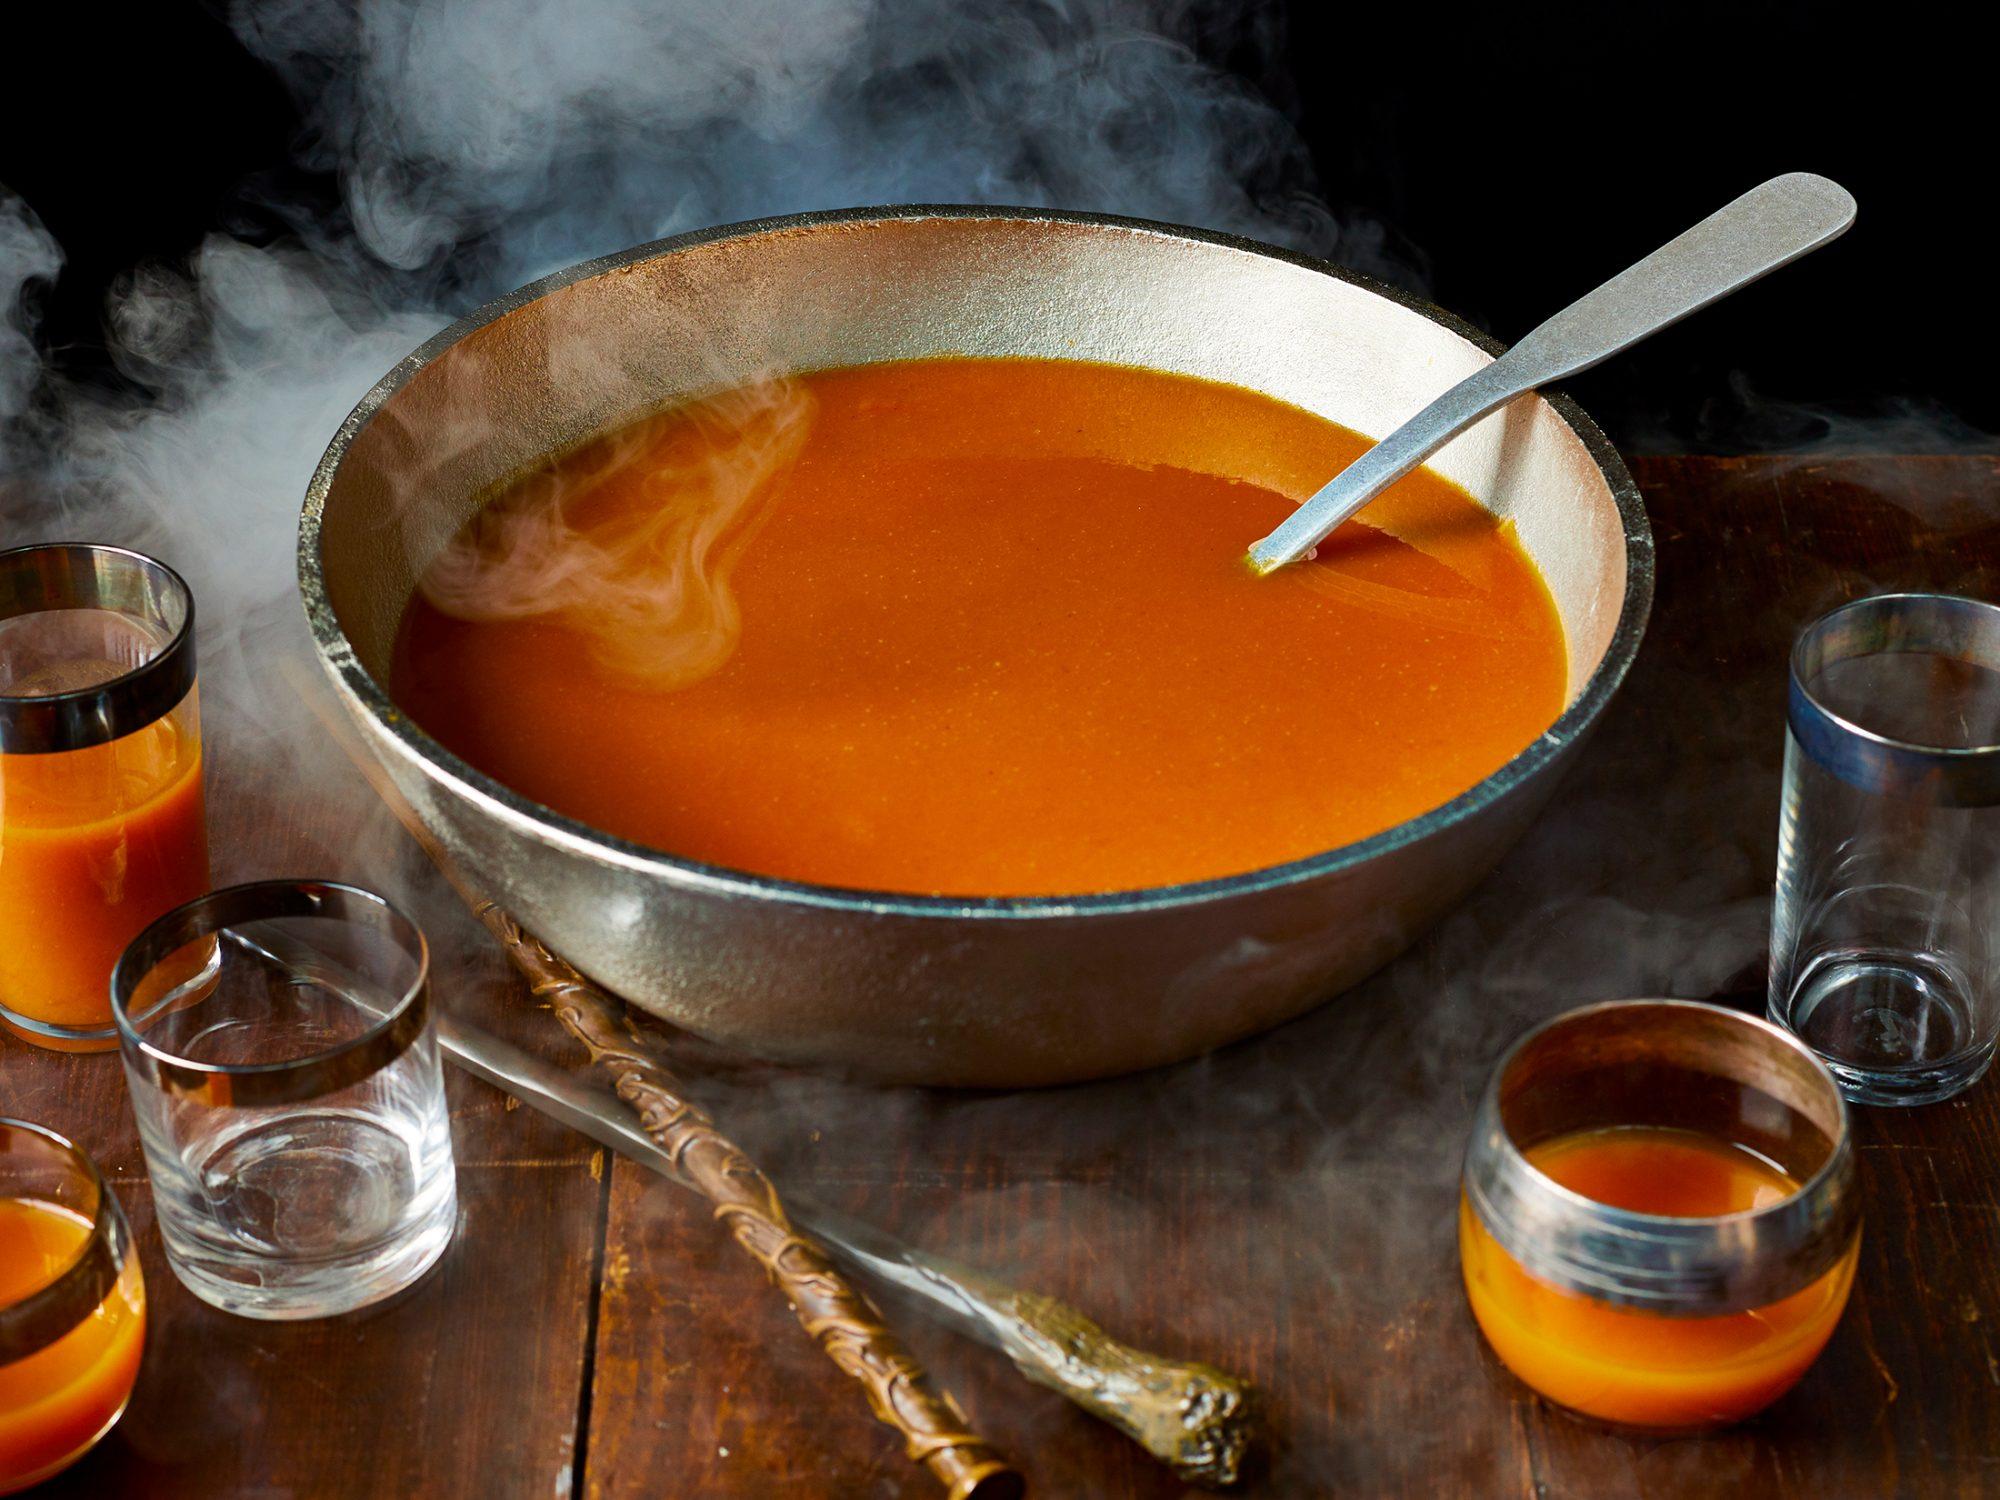 Pumpkin Juice image